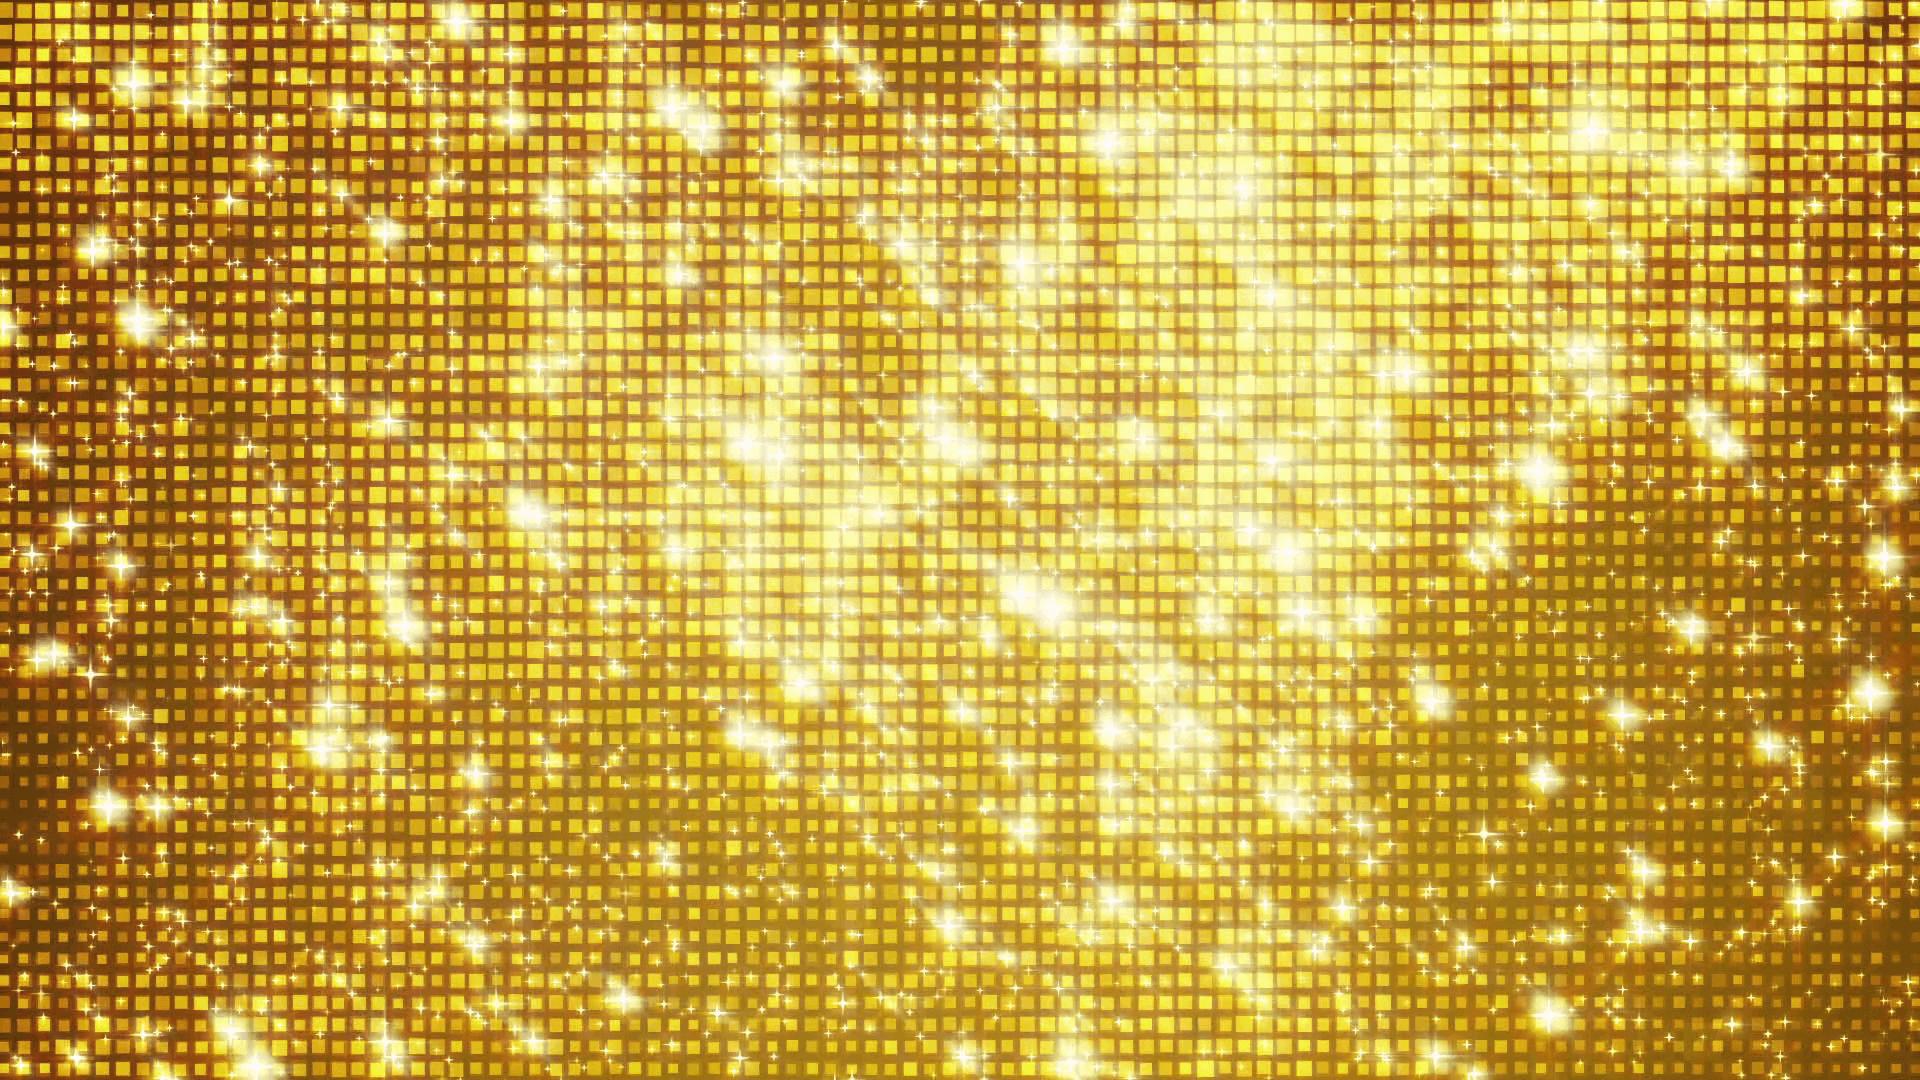 Golden Backgrounds - Wallpaper Cave